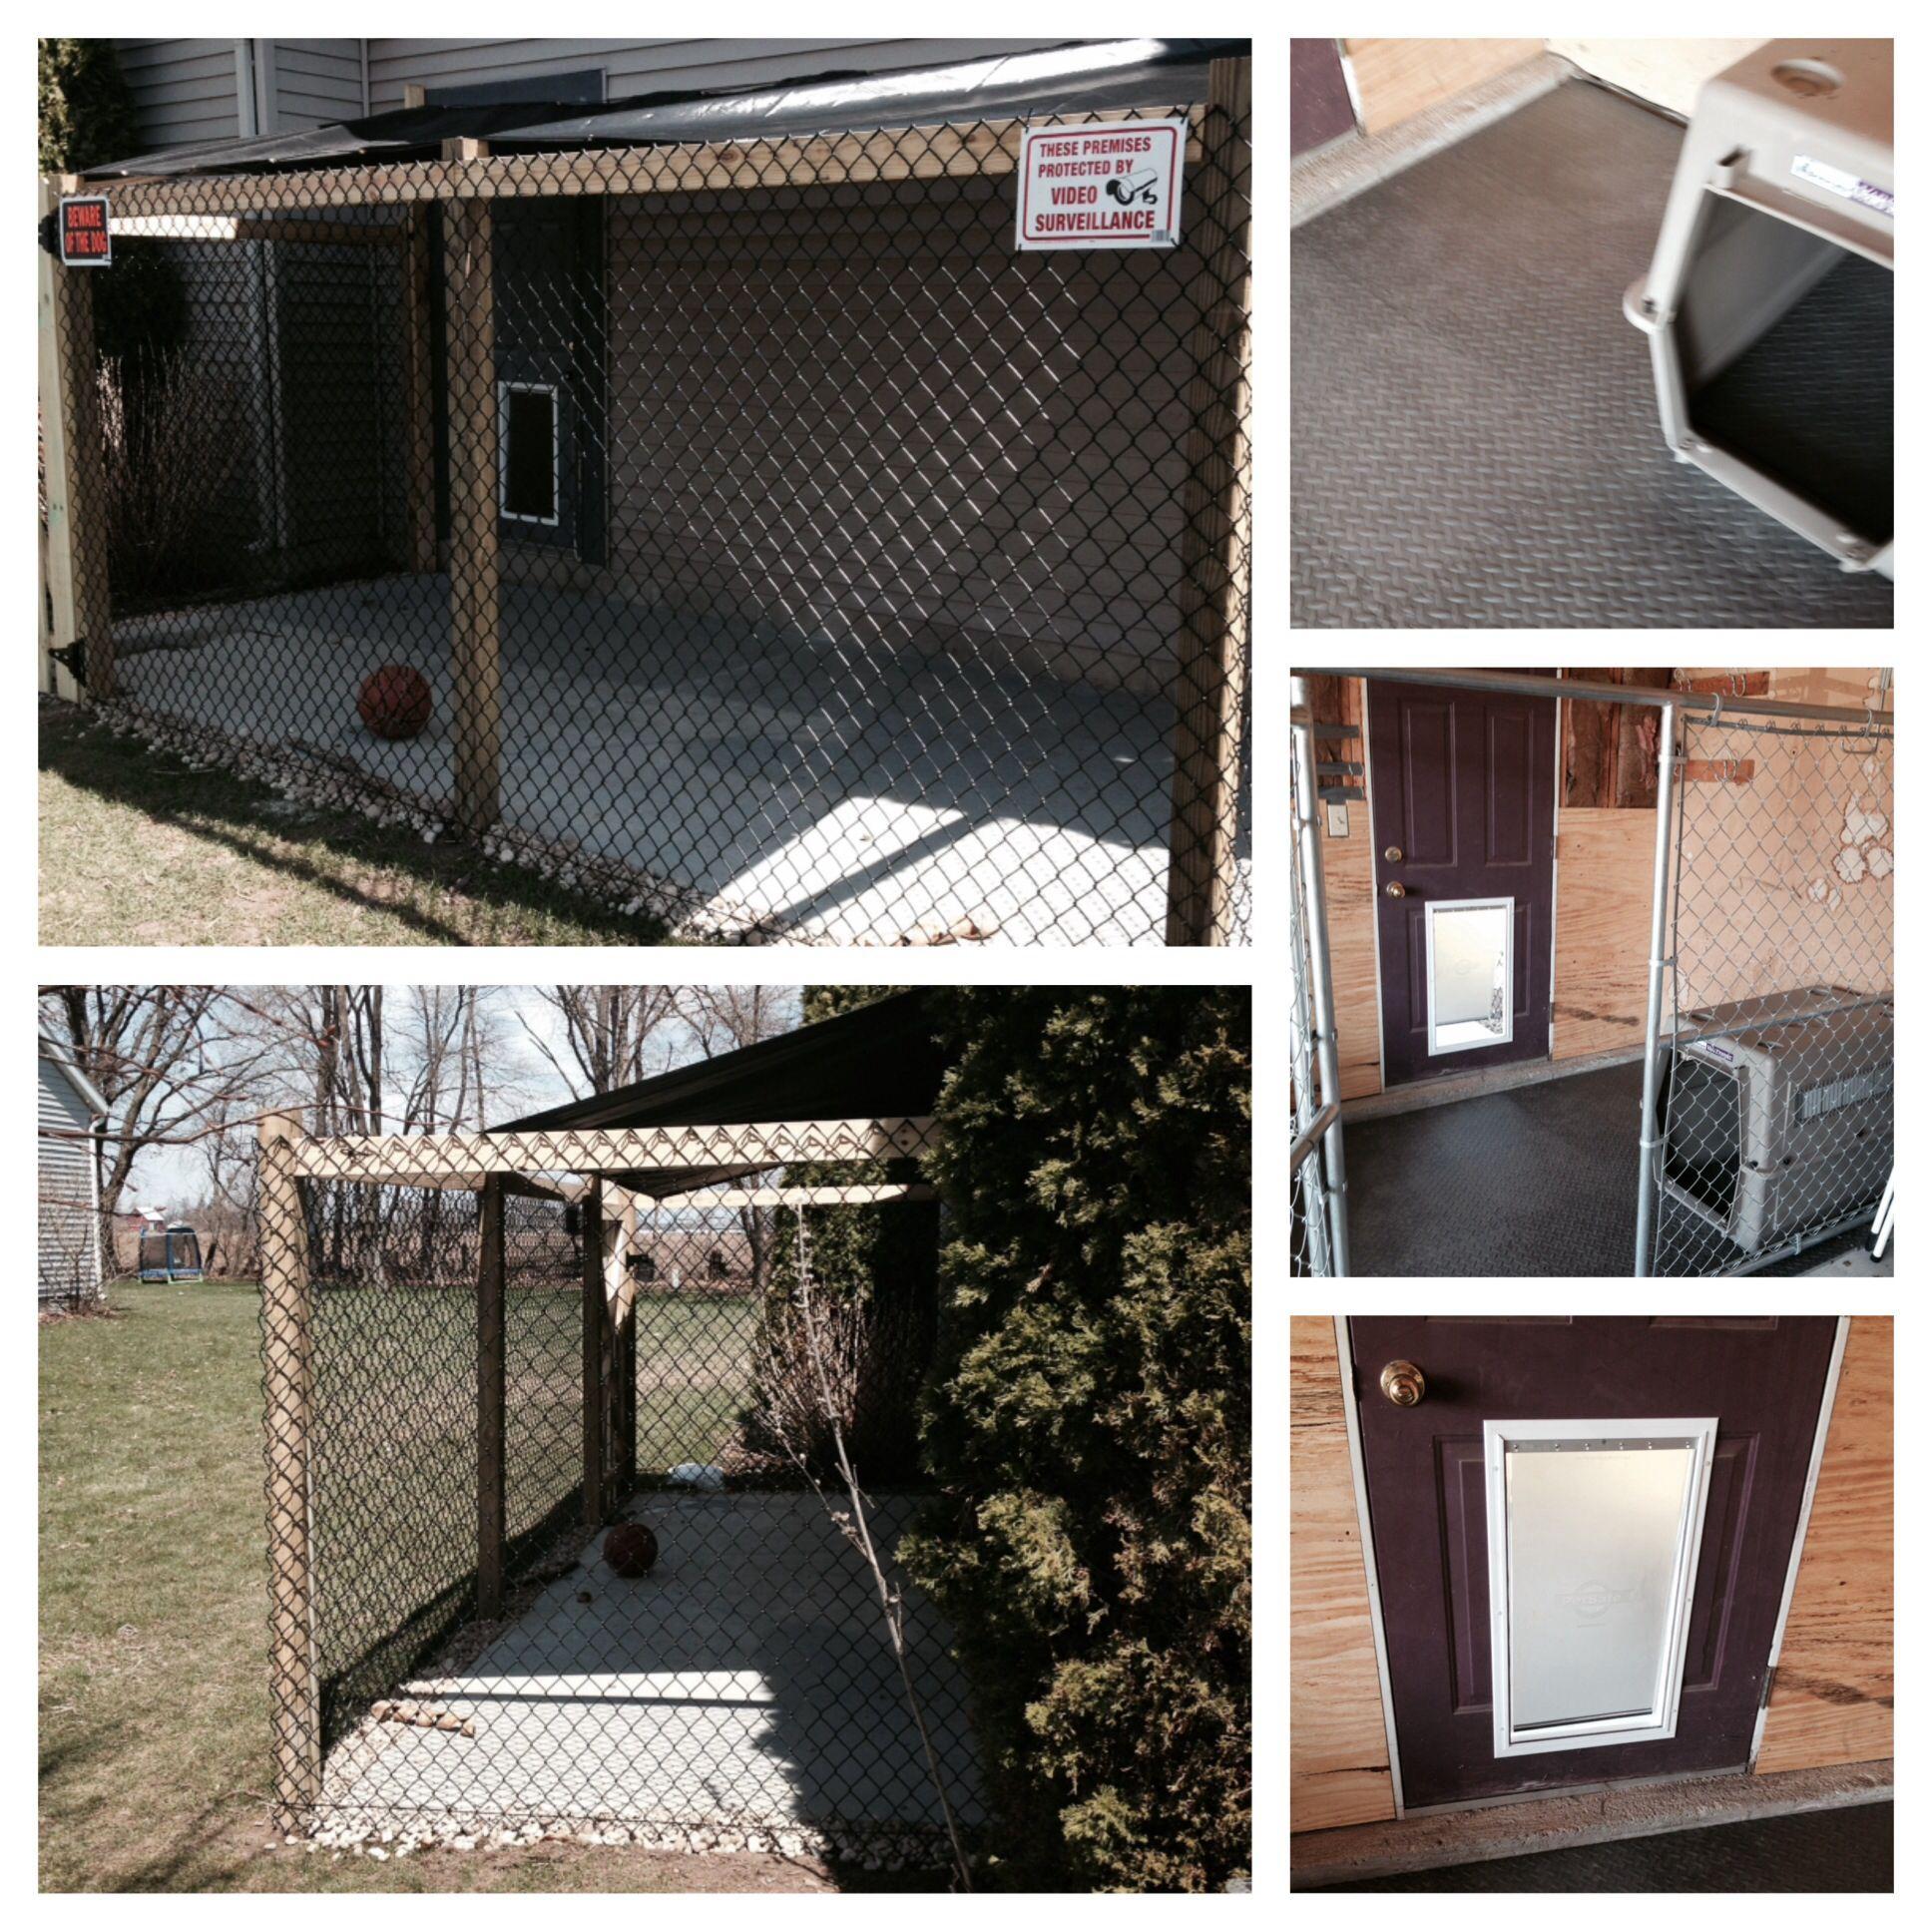 Indoor outdoor dog kennel Home Ideas Pinterest